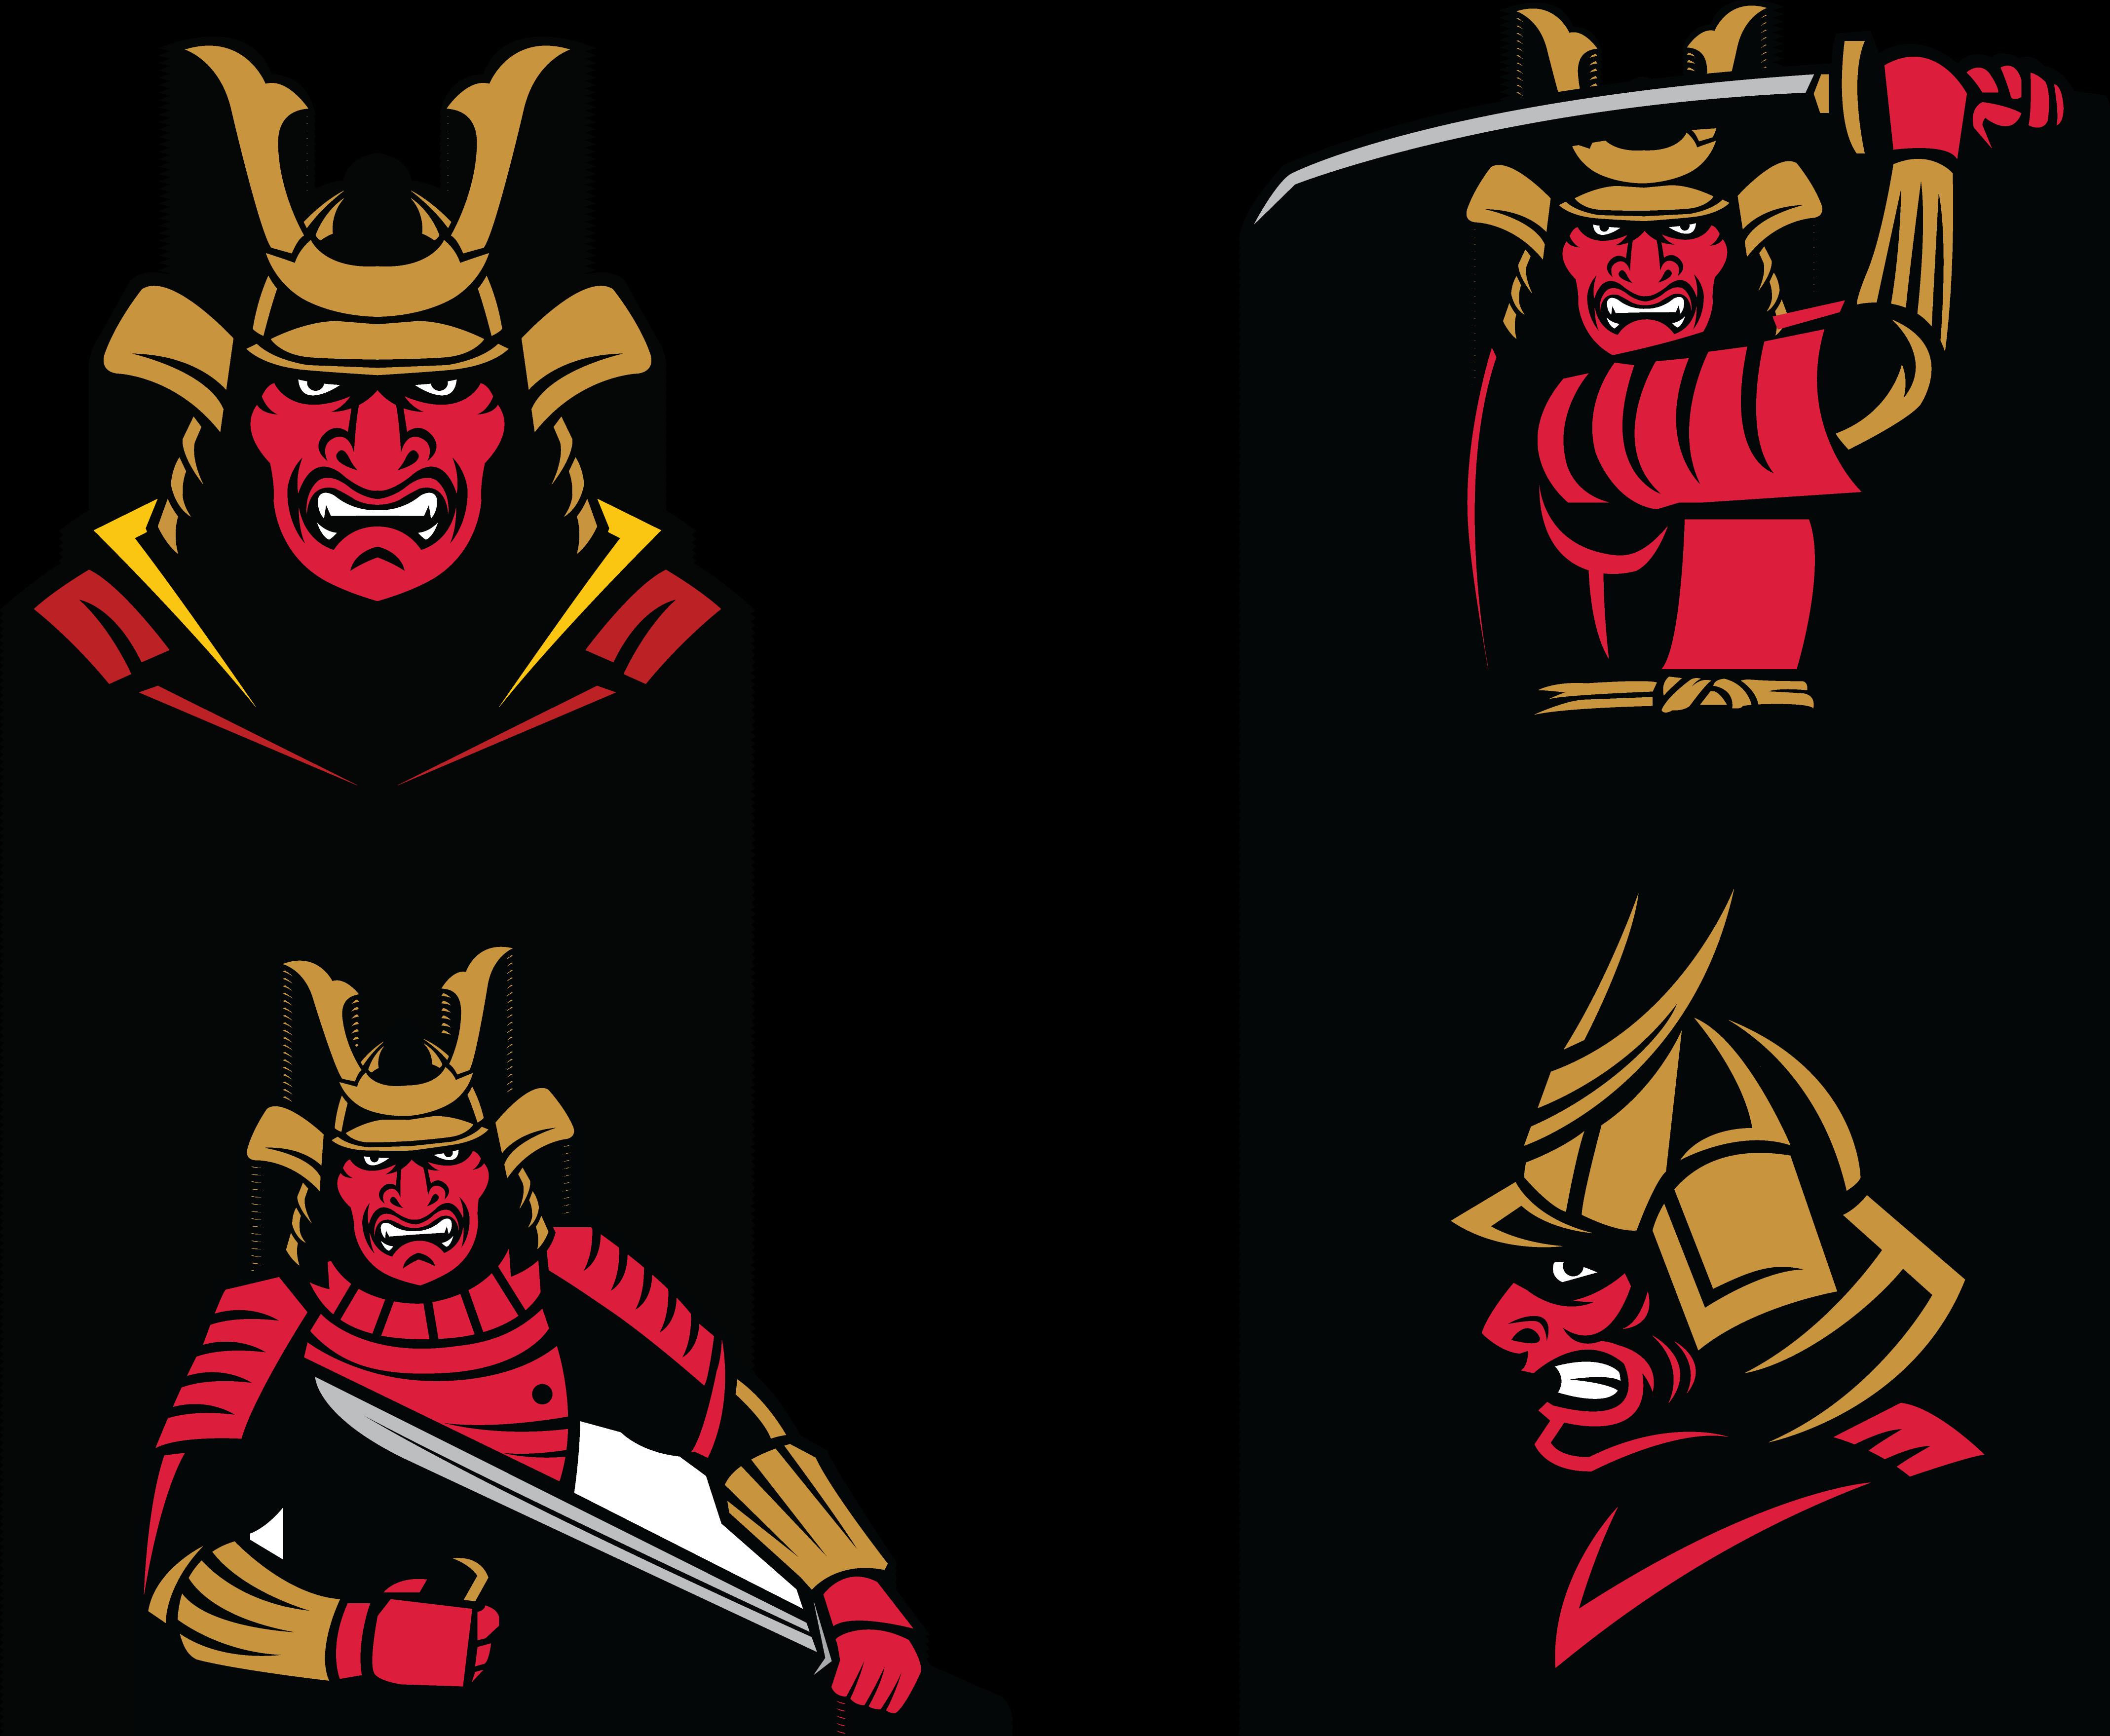 Warrior clipart soldier egyptian. Samurai clip art ancient